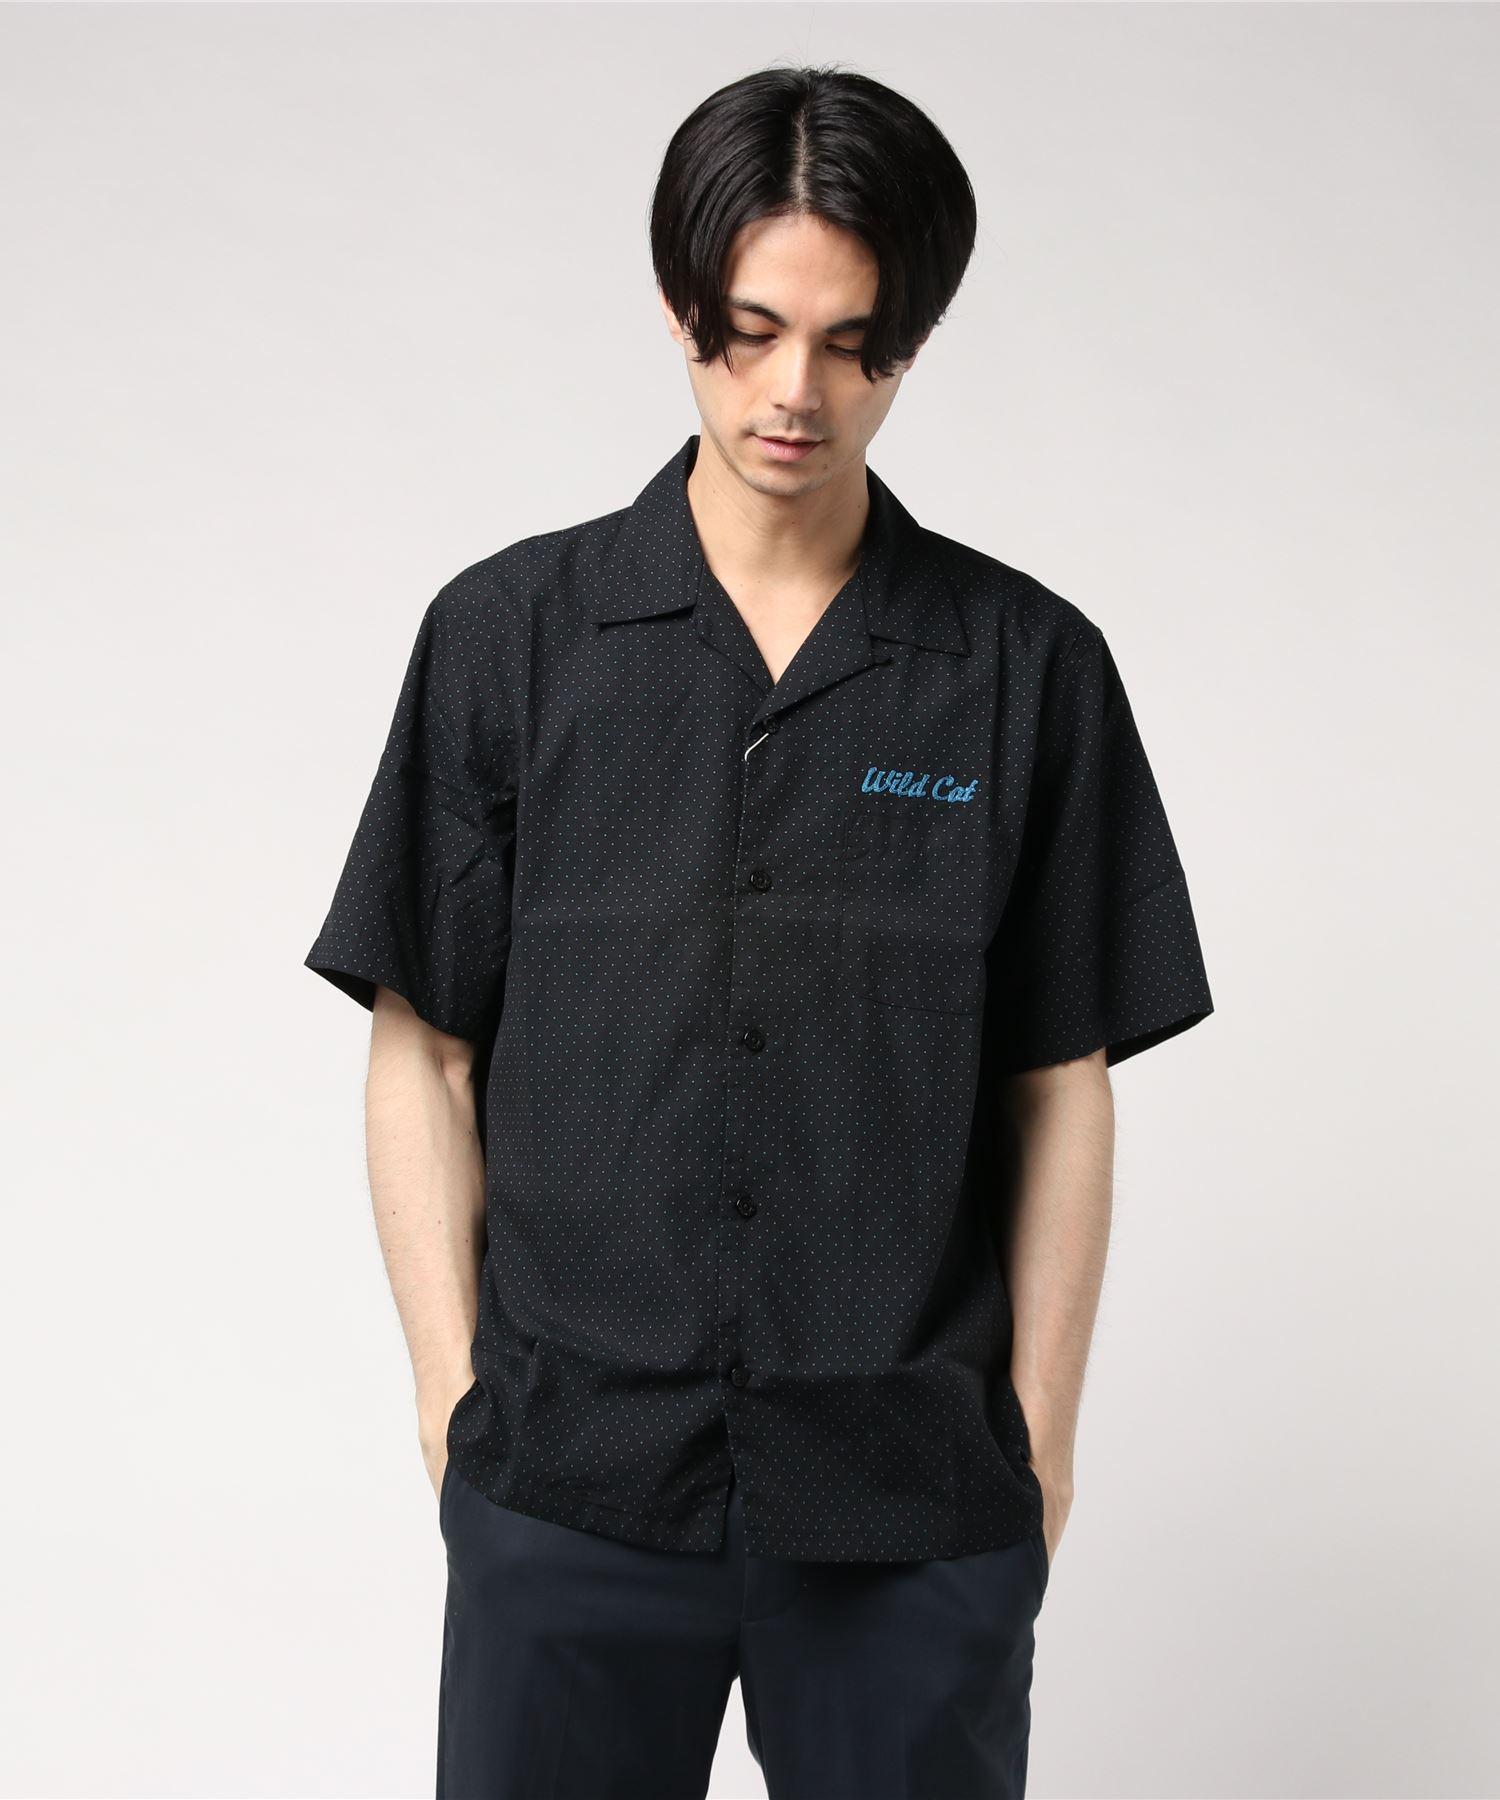 WILD CAT刺繍 半袖ボーリングシャツ